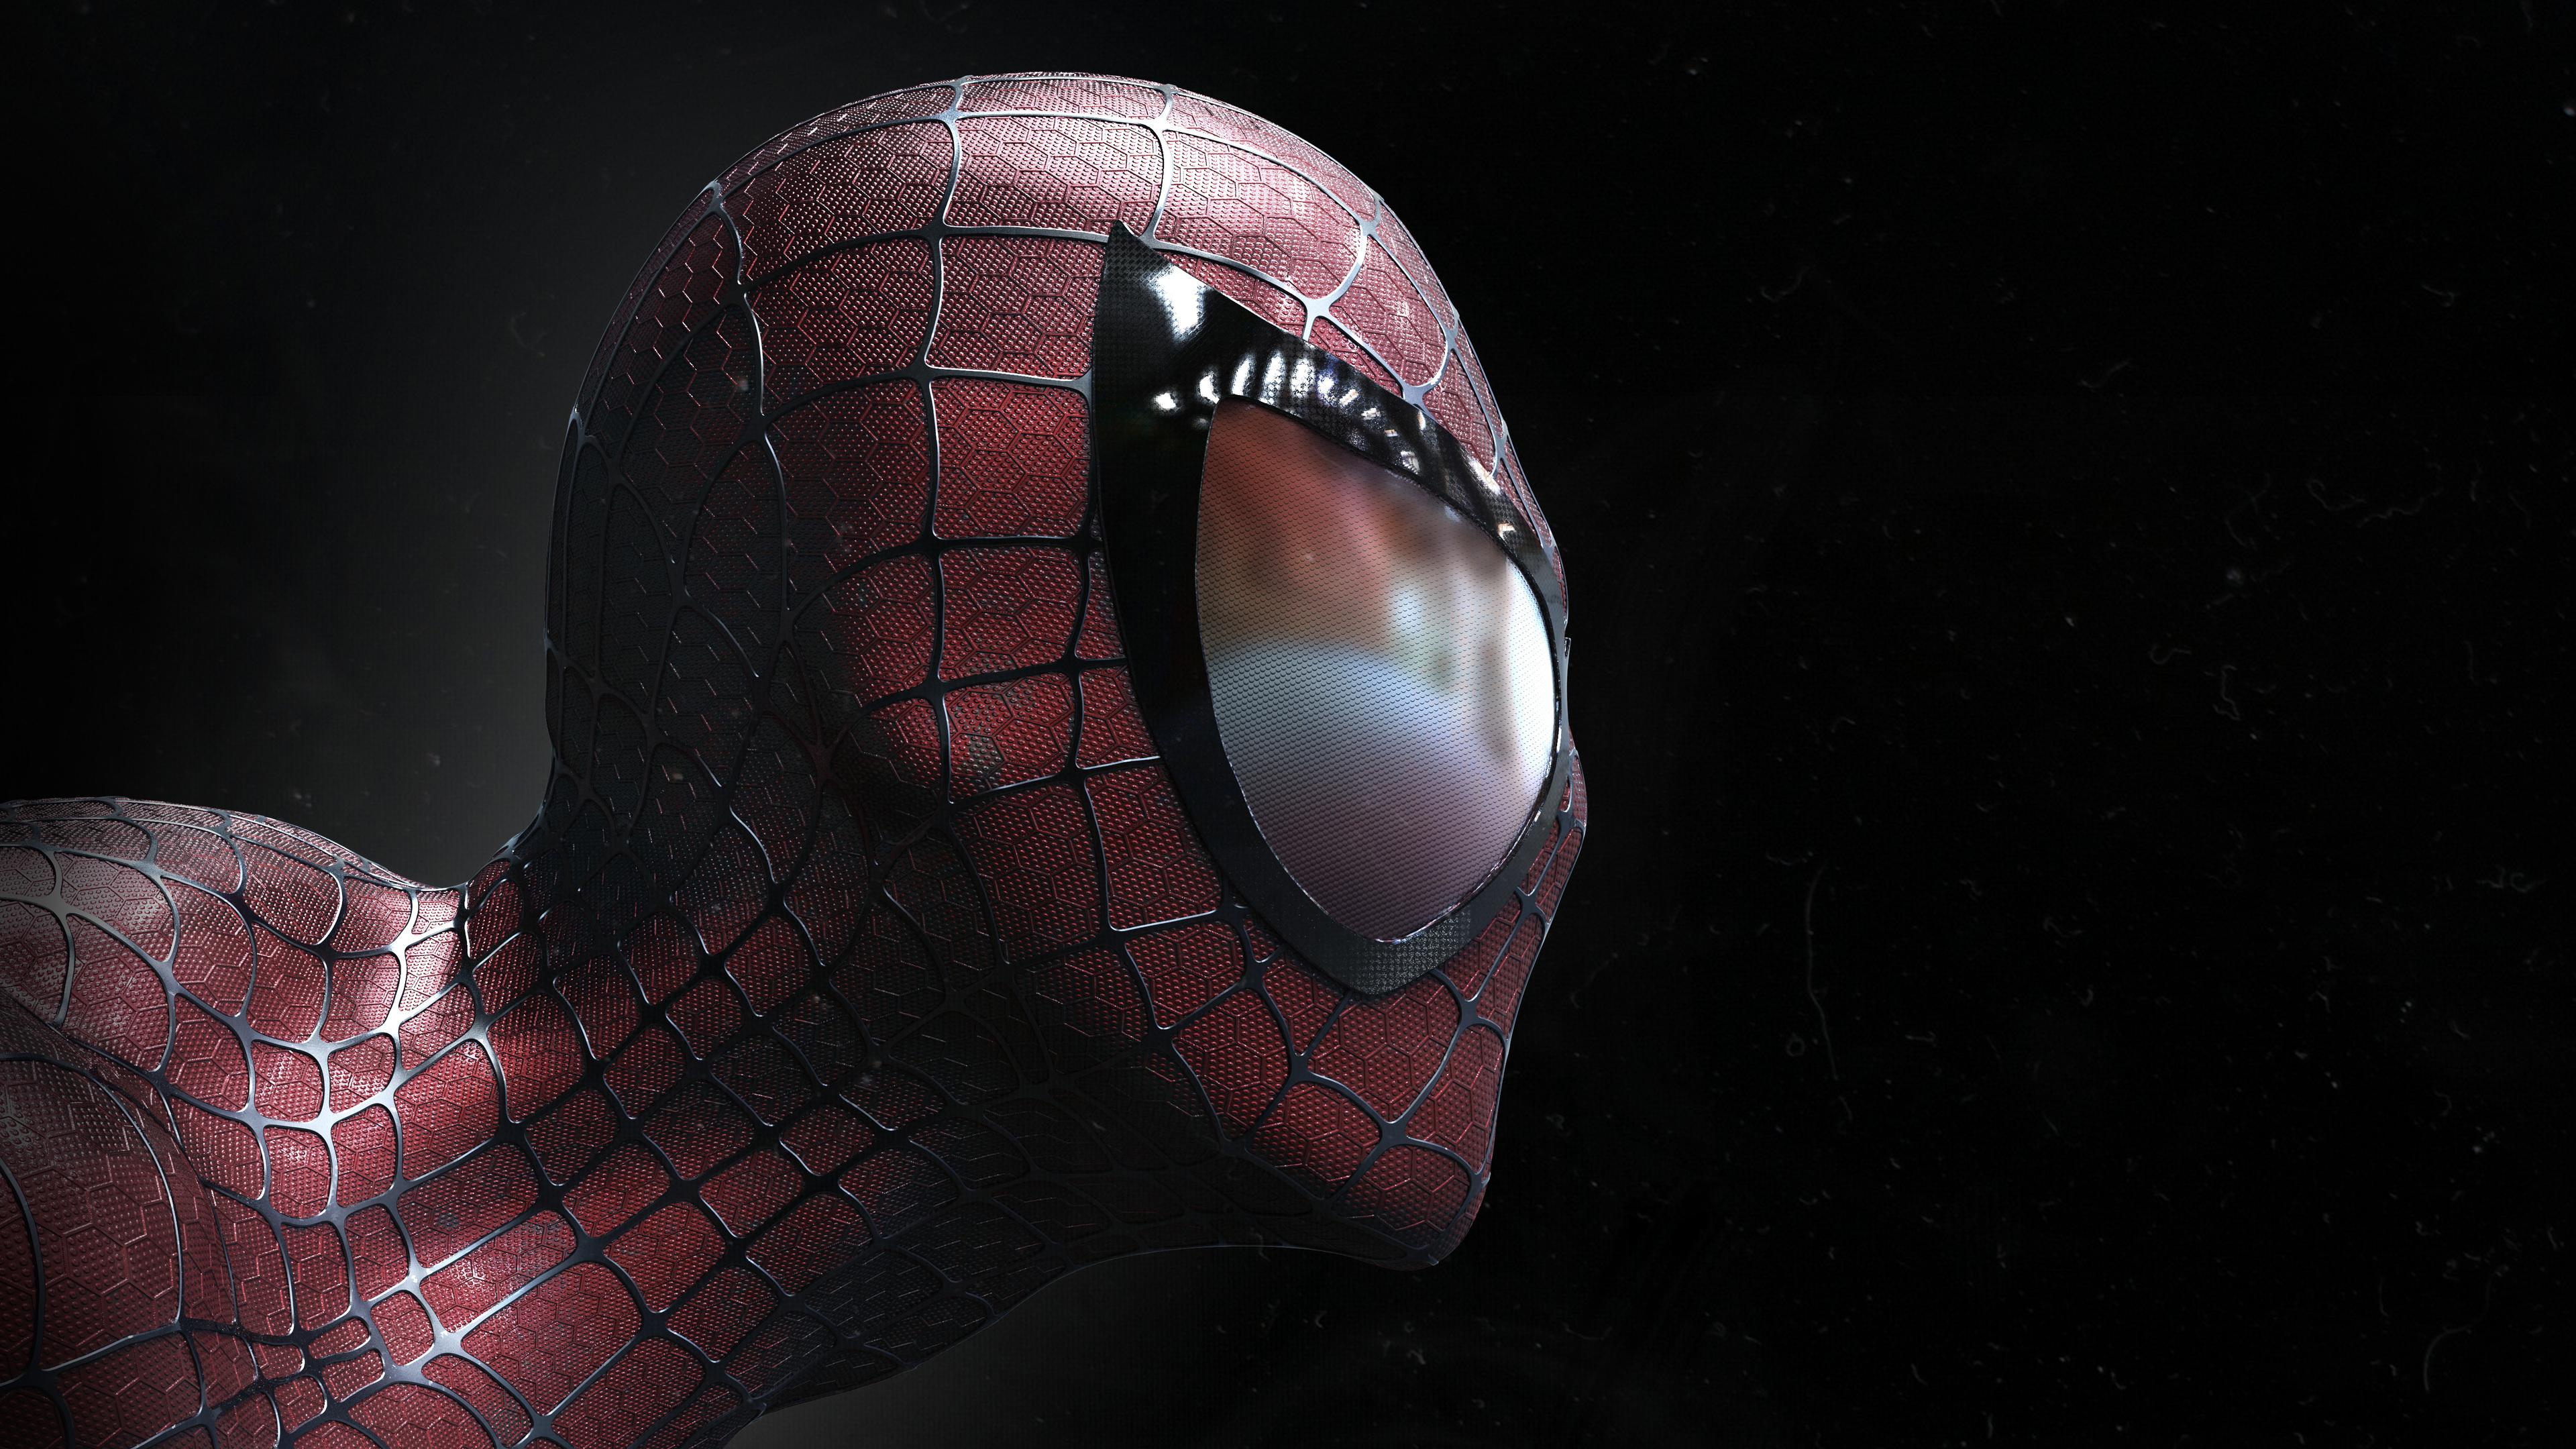 spiderman closeup artwork 1536522674 - Spiderman Closeup Artwork - superheroes wallpapers, spiderman wallpapers, hd-wallpapers, digital art wallpapers, closeup wallpapers, artwork wallpapers, artist wallpapers, 5k wallpapers, 4k-wallpapers